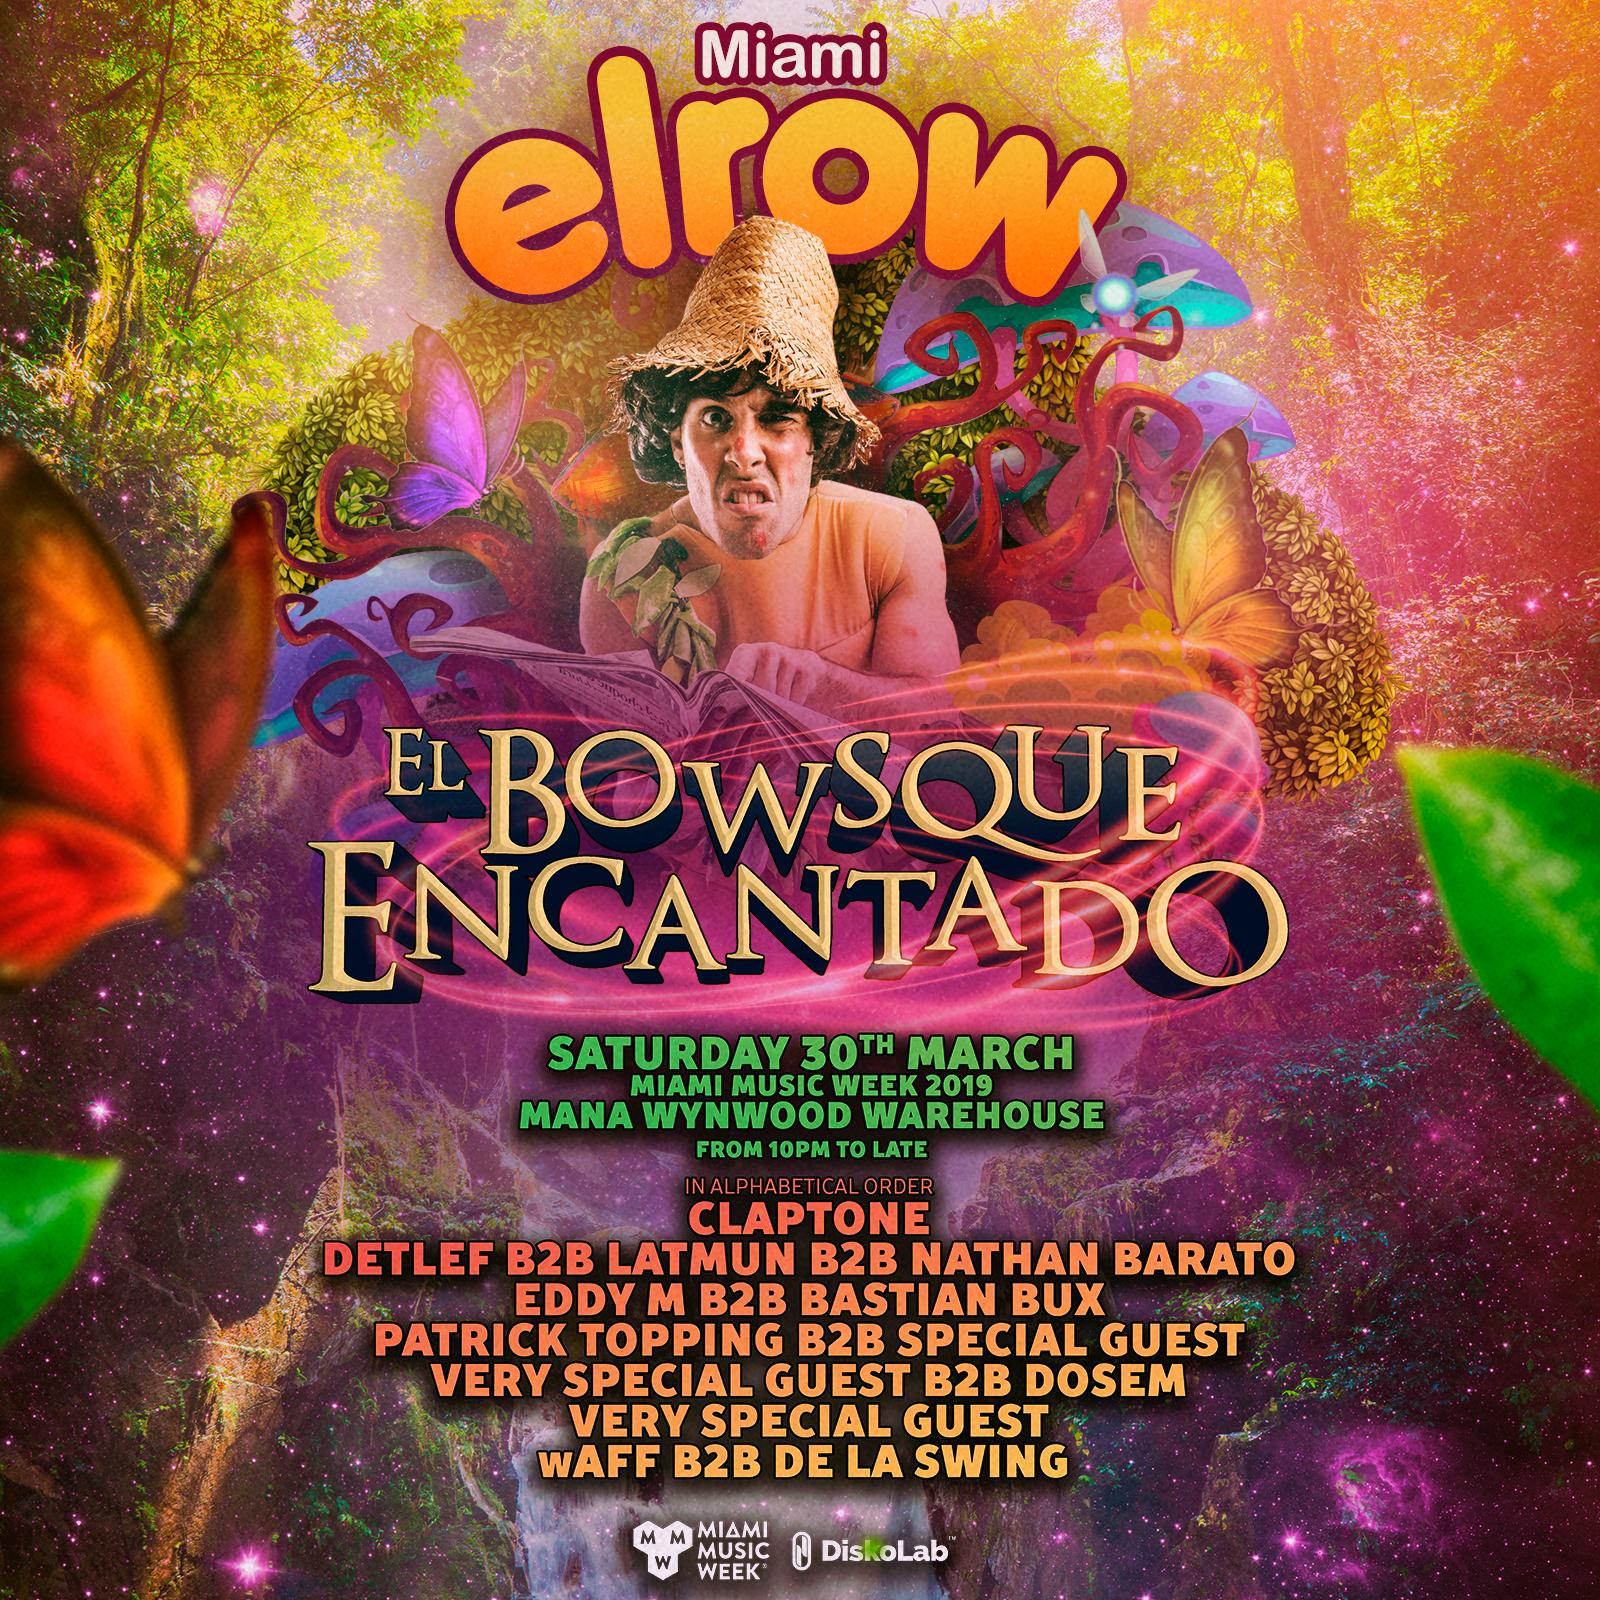 Elrow Miami Music Week 2019 Image